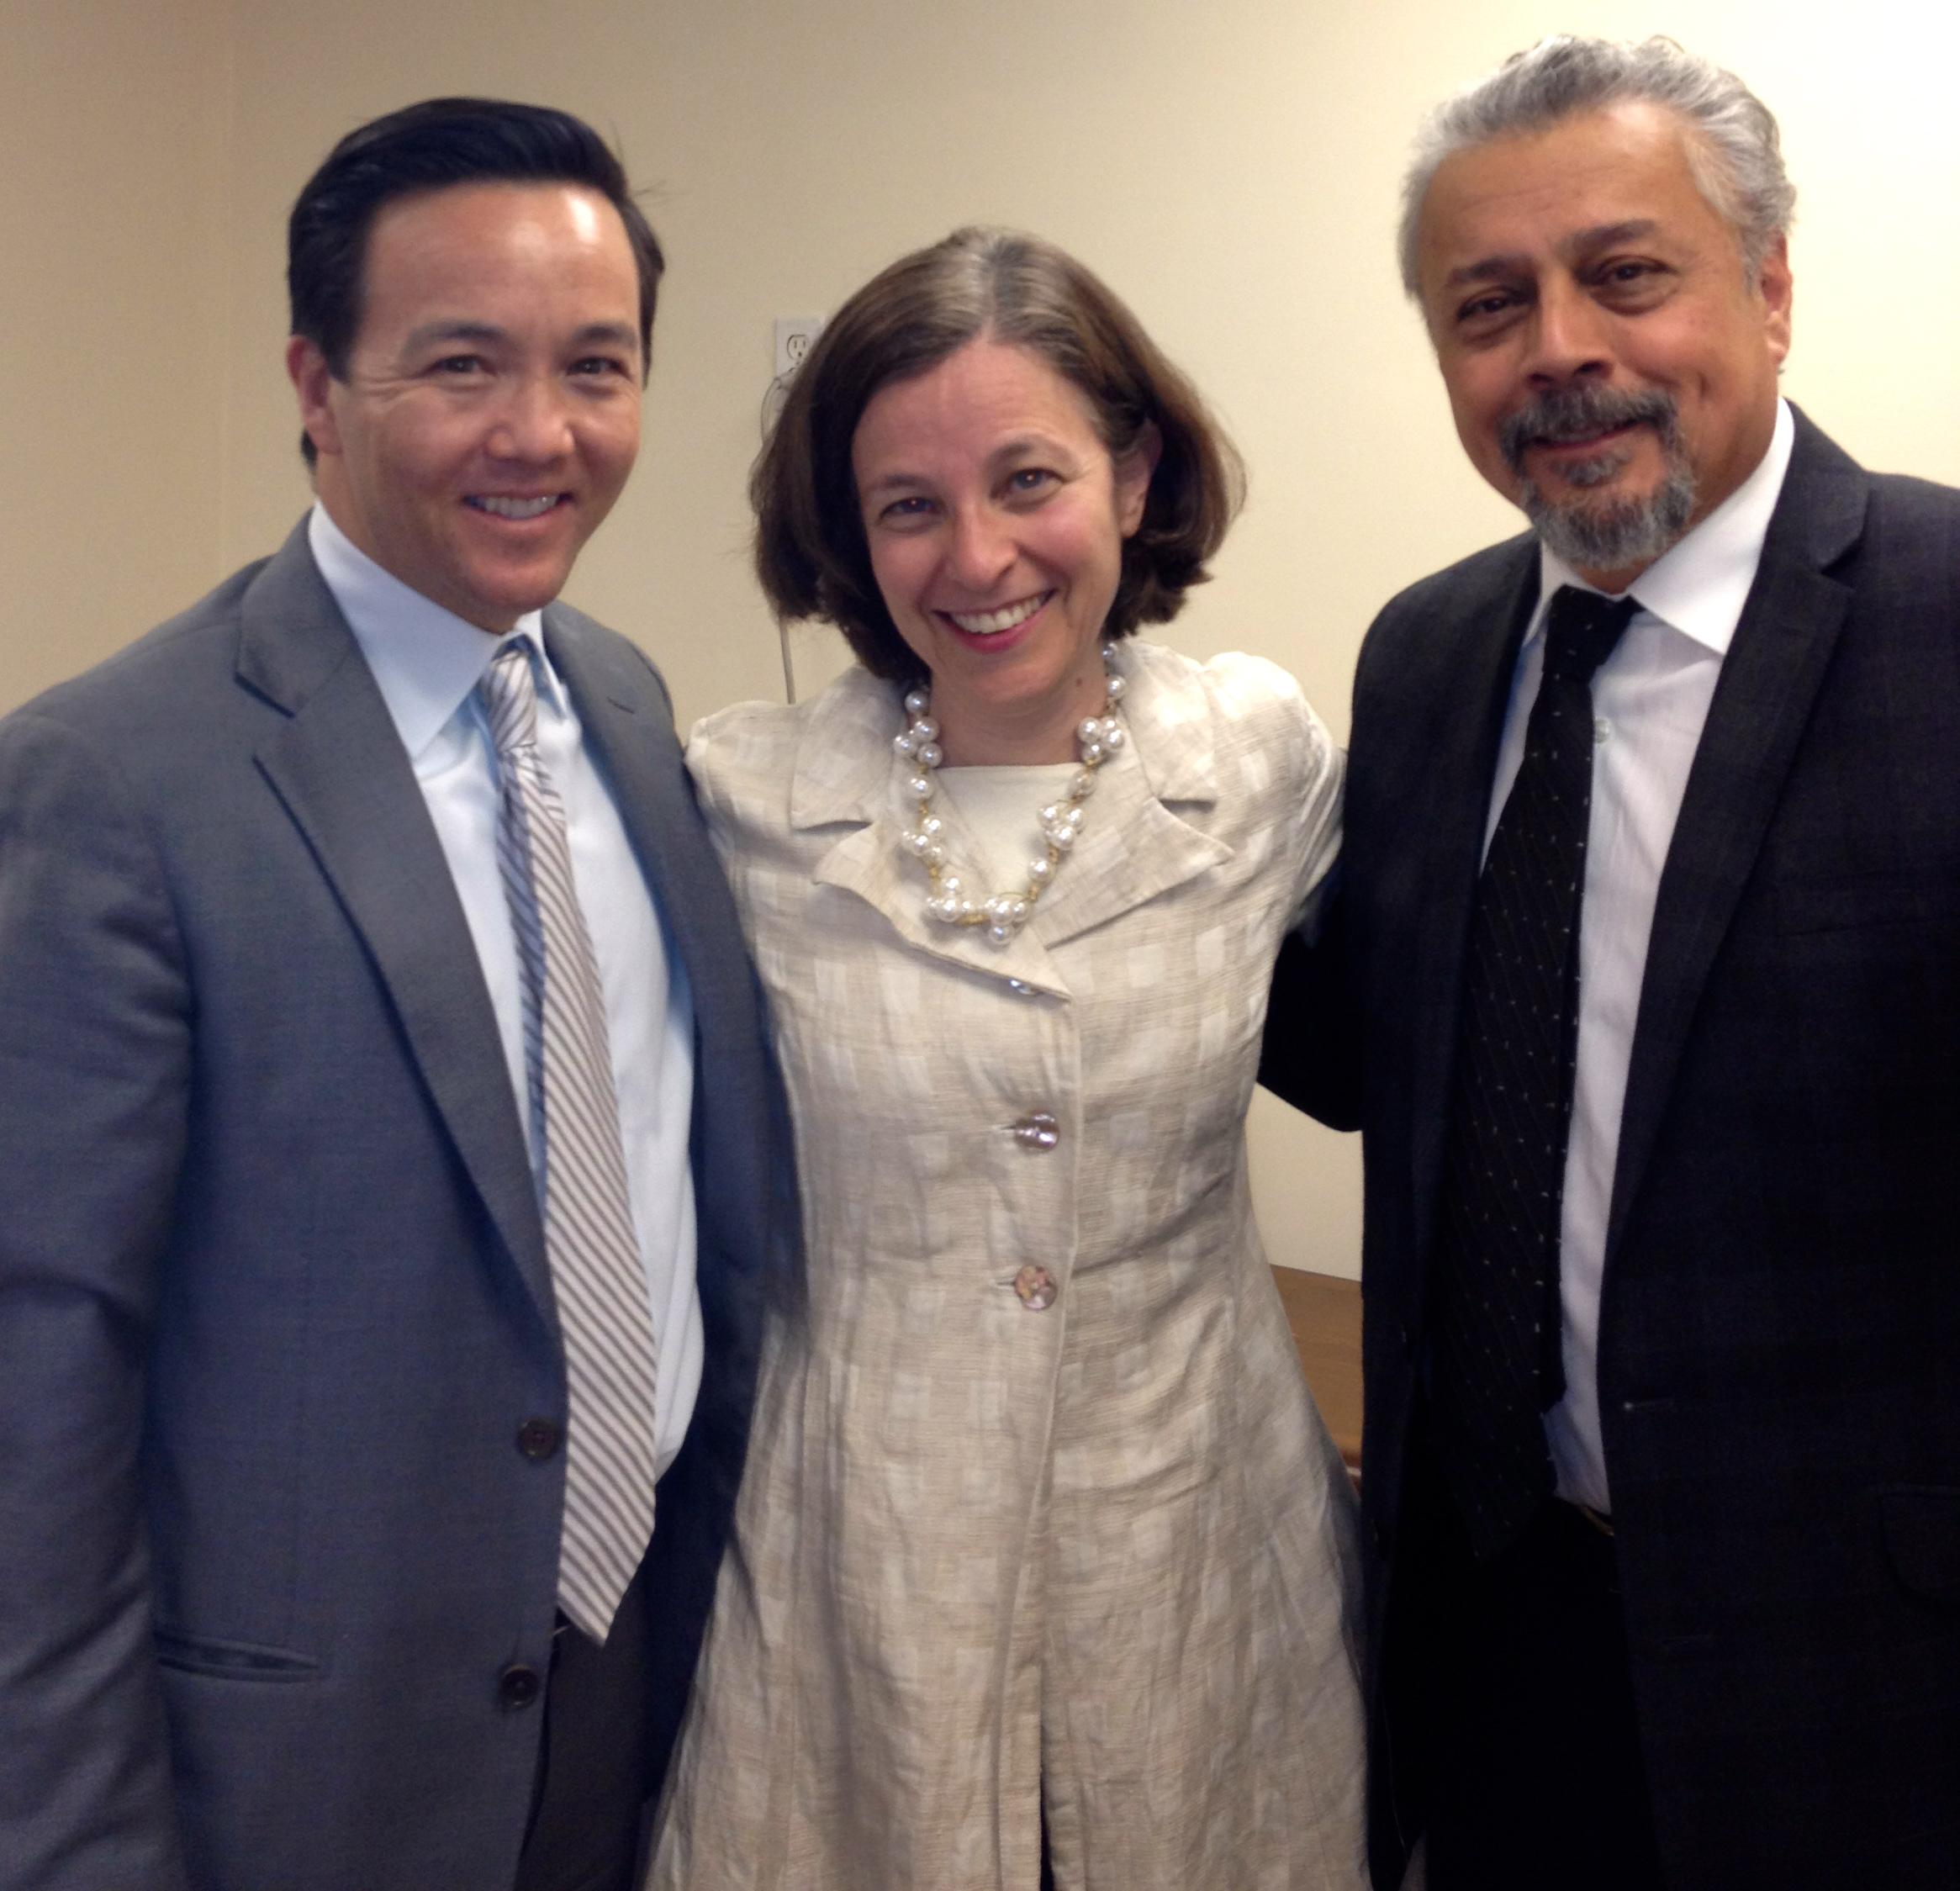 Meeting with Federal Reserve Governor Sarah Raskin